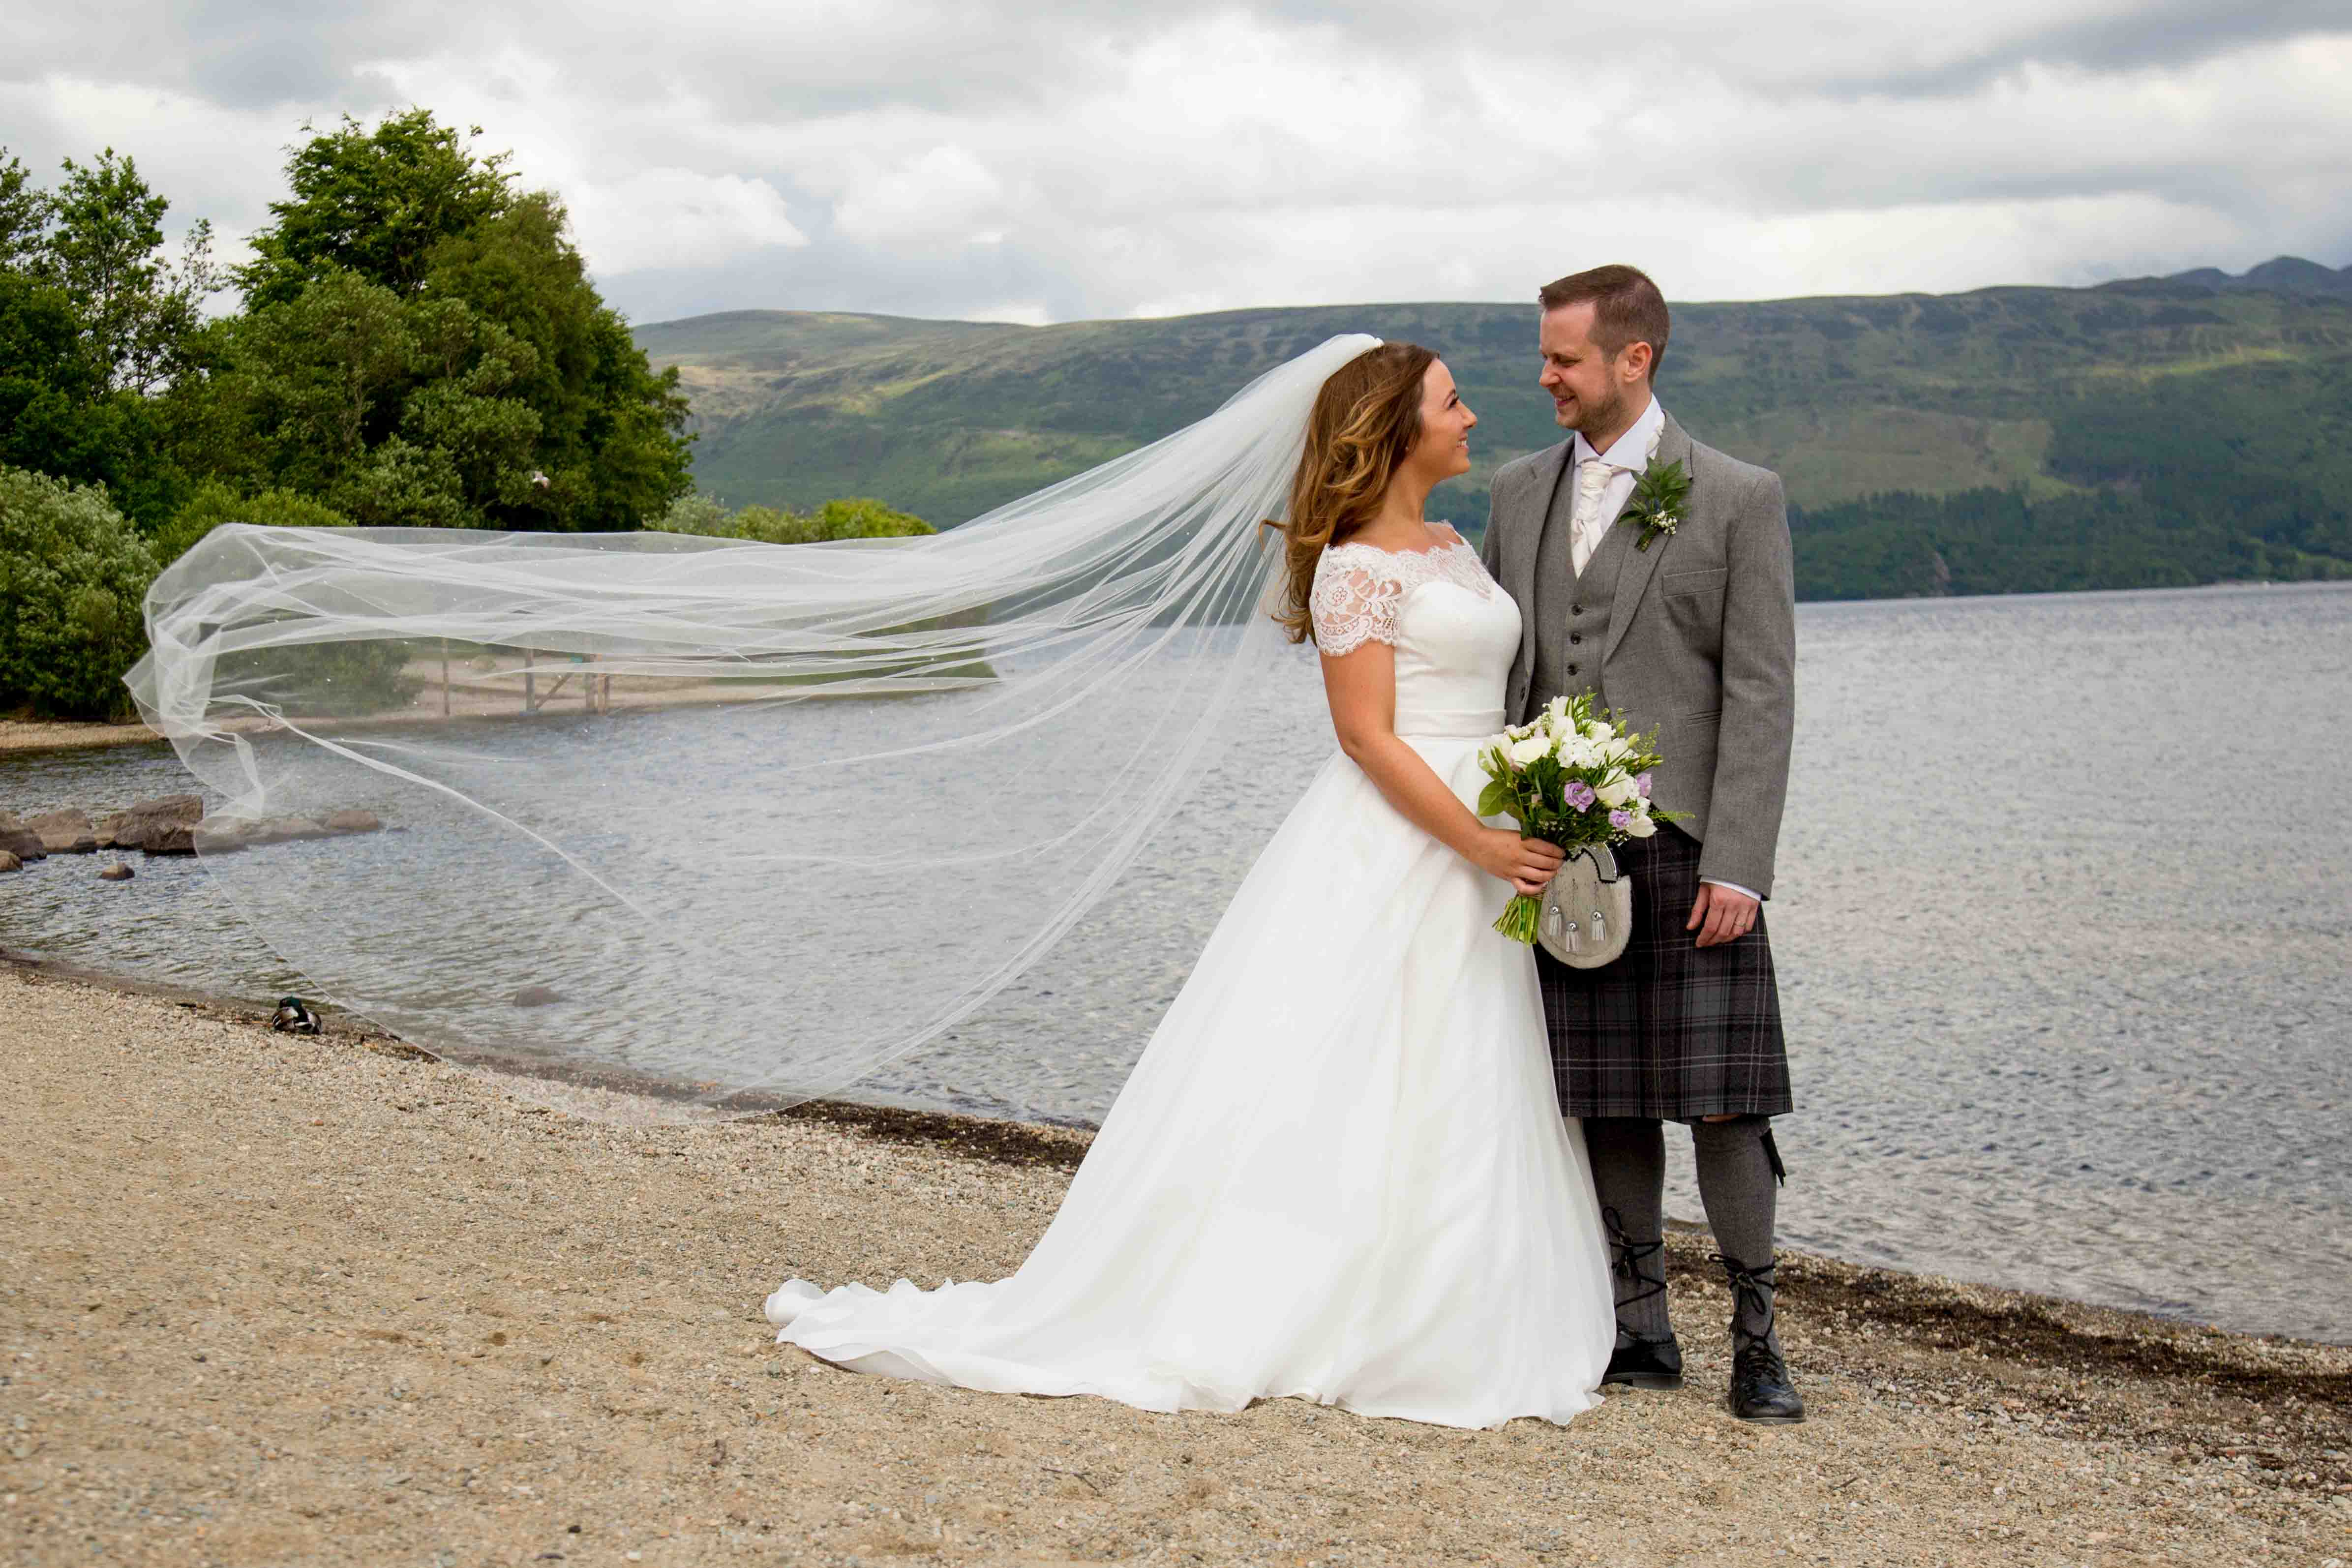 4lovepolkadots real wedding share